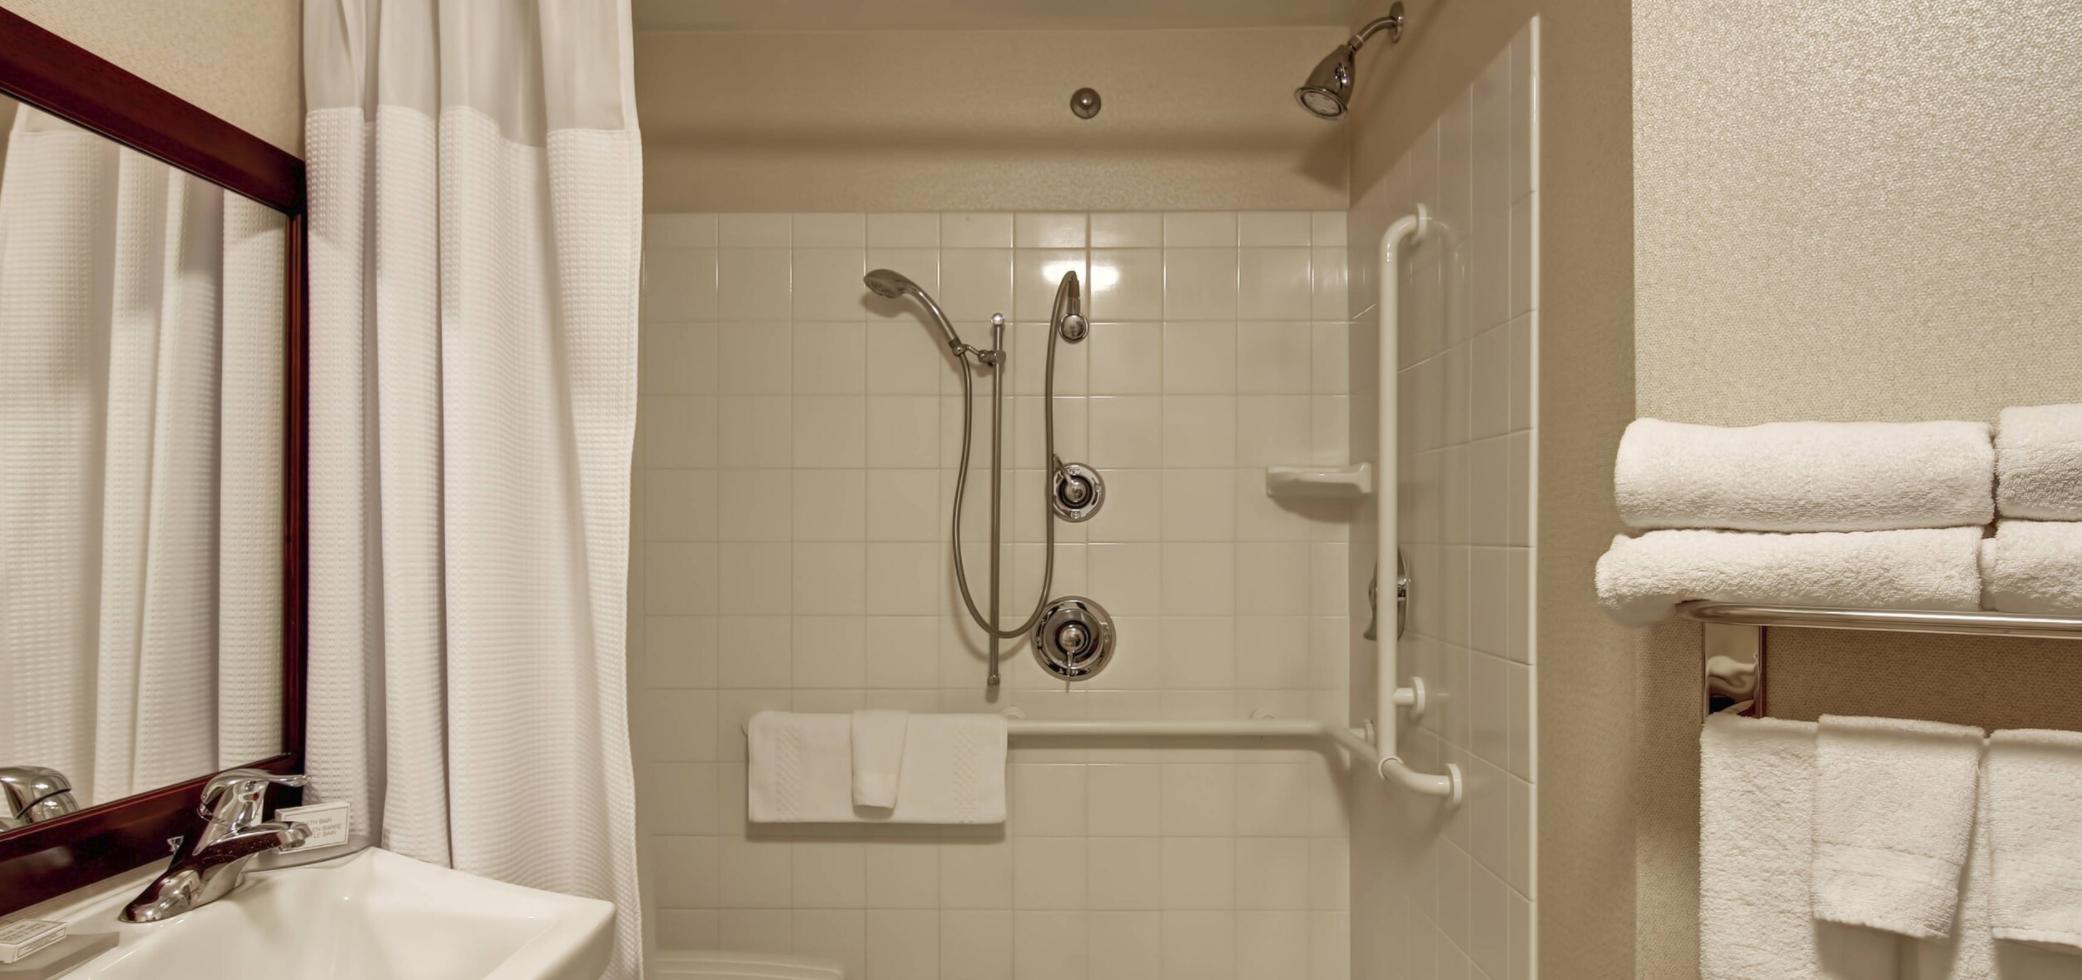 https://www.hotelsbyday.com/_data/default-hotel_image/4/21261/screenshot-2020-08-21-at-11-44-53-am.png